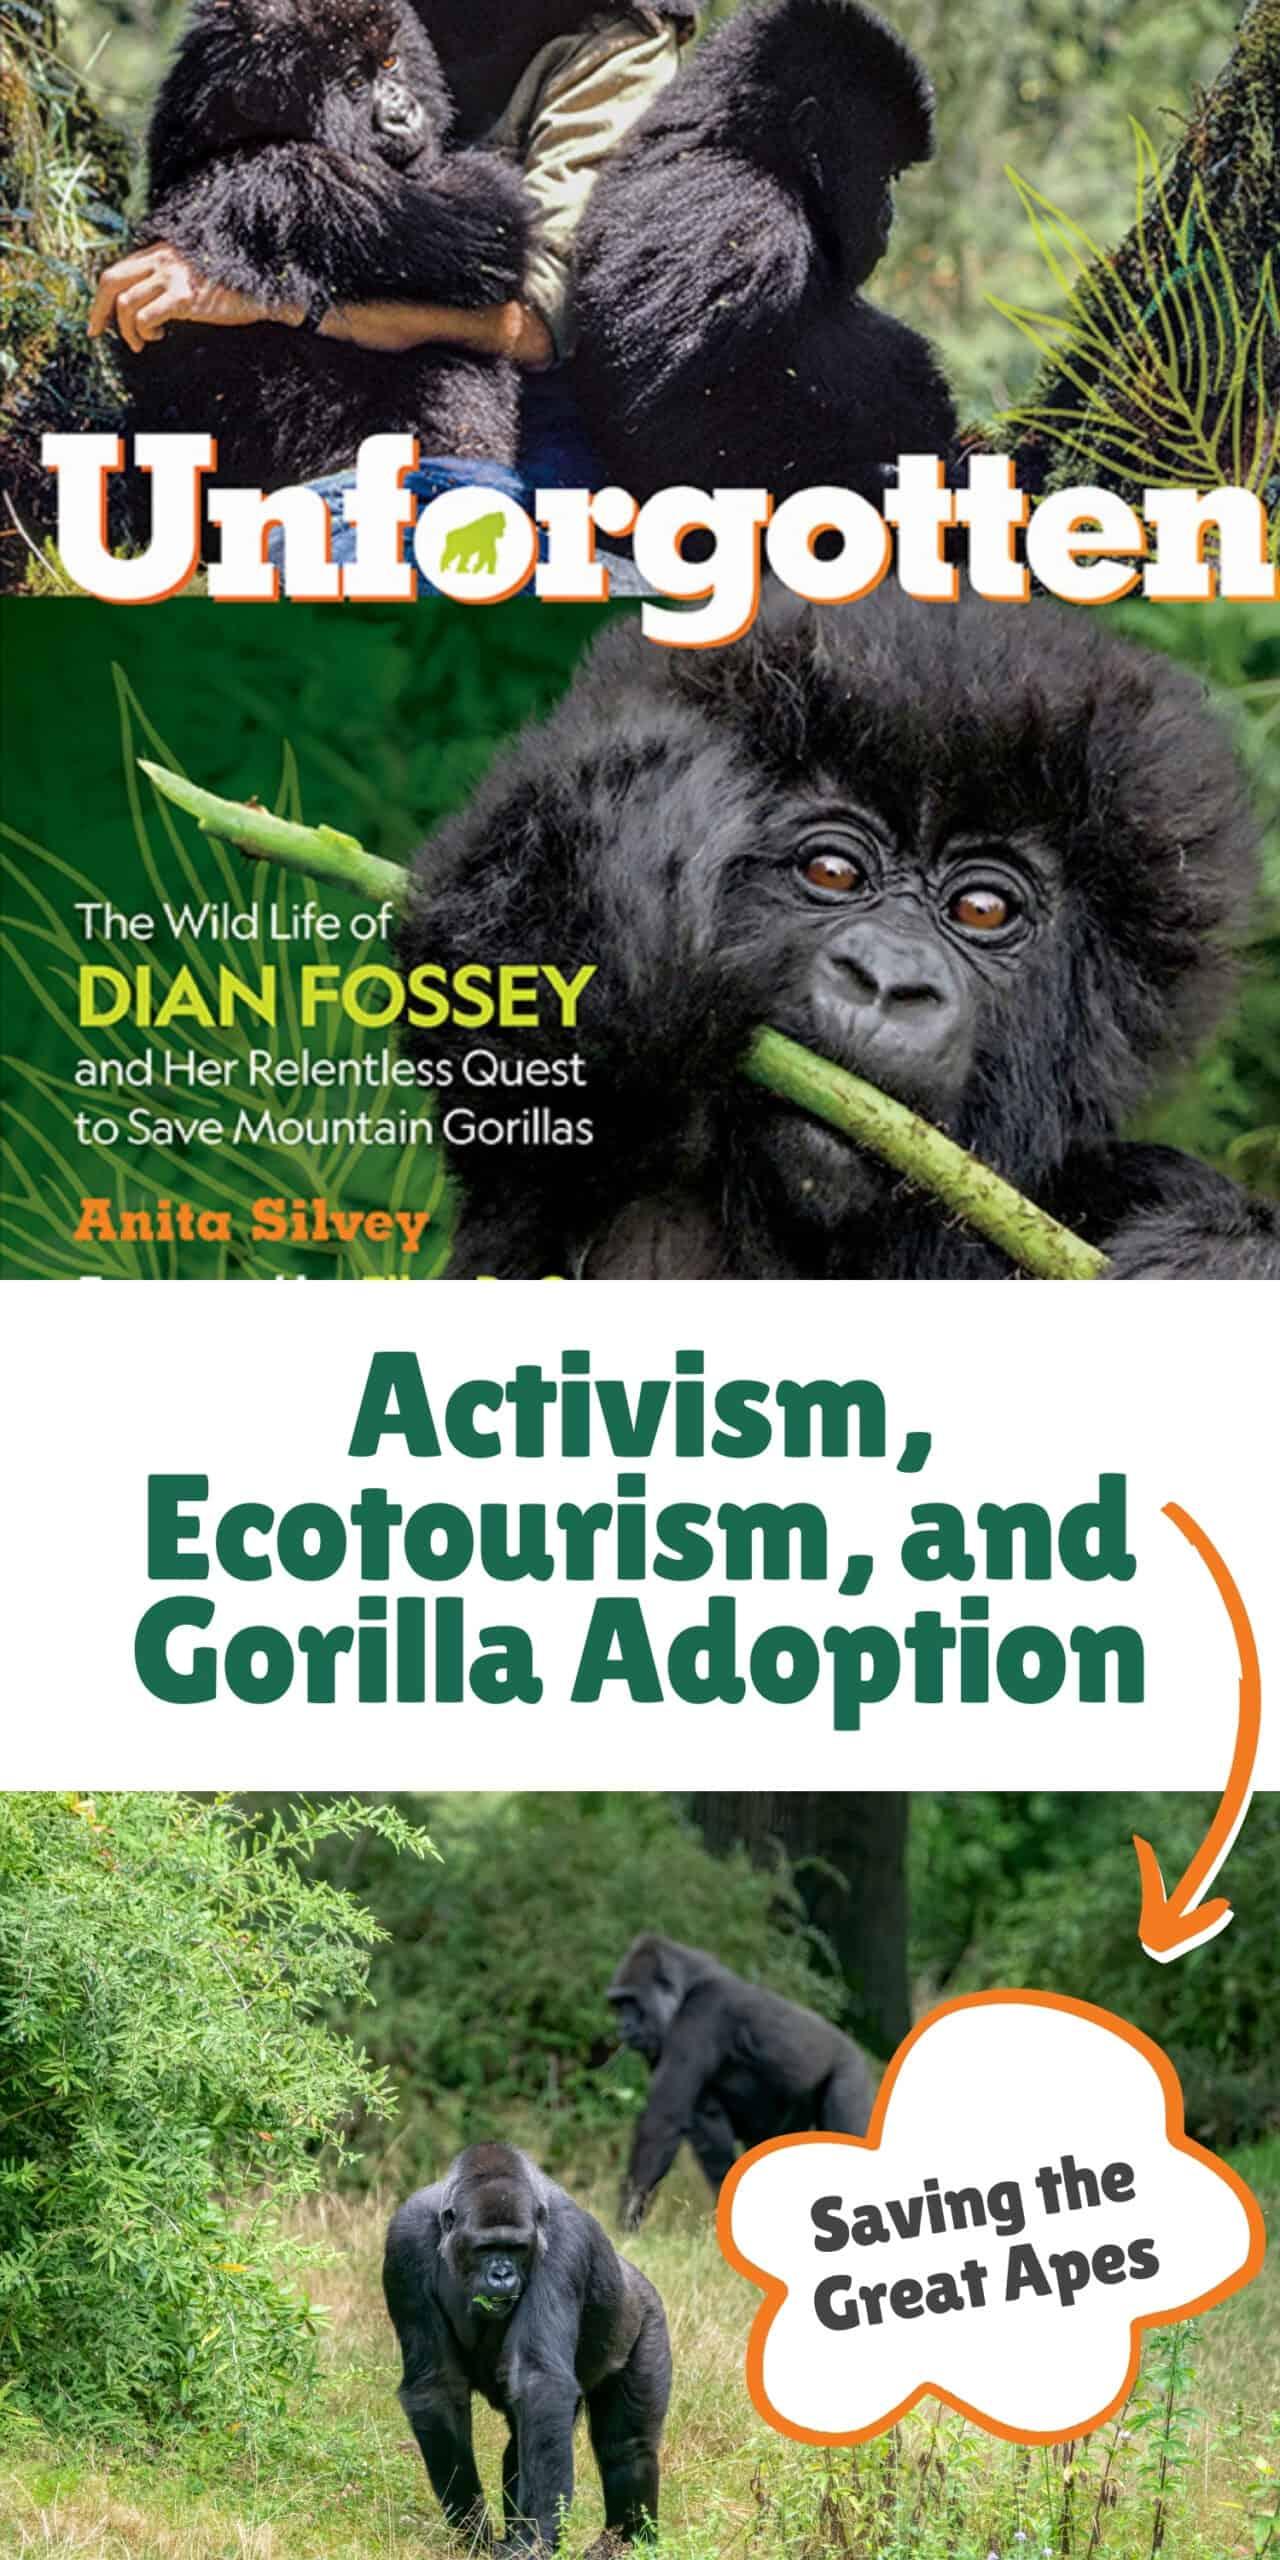 Activism, Ecotourism, and Gorilla Adoption – Saving the Great Apes